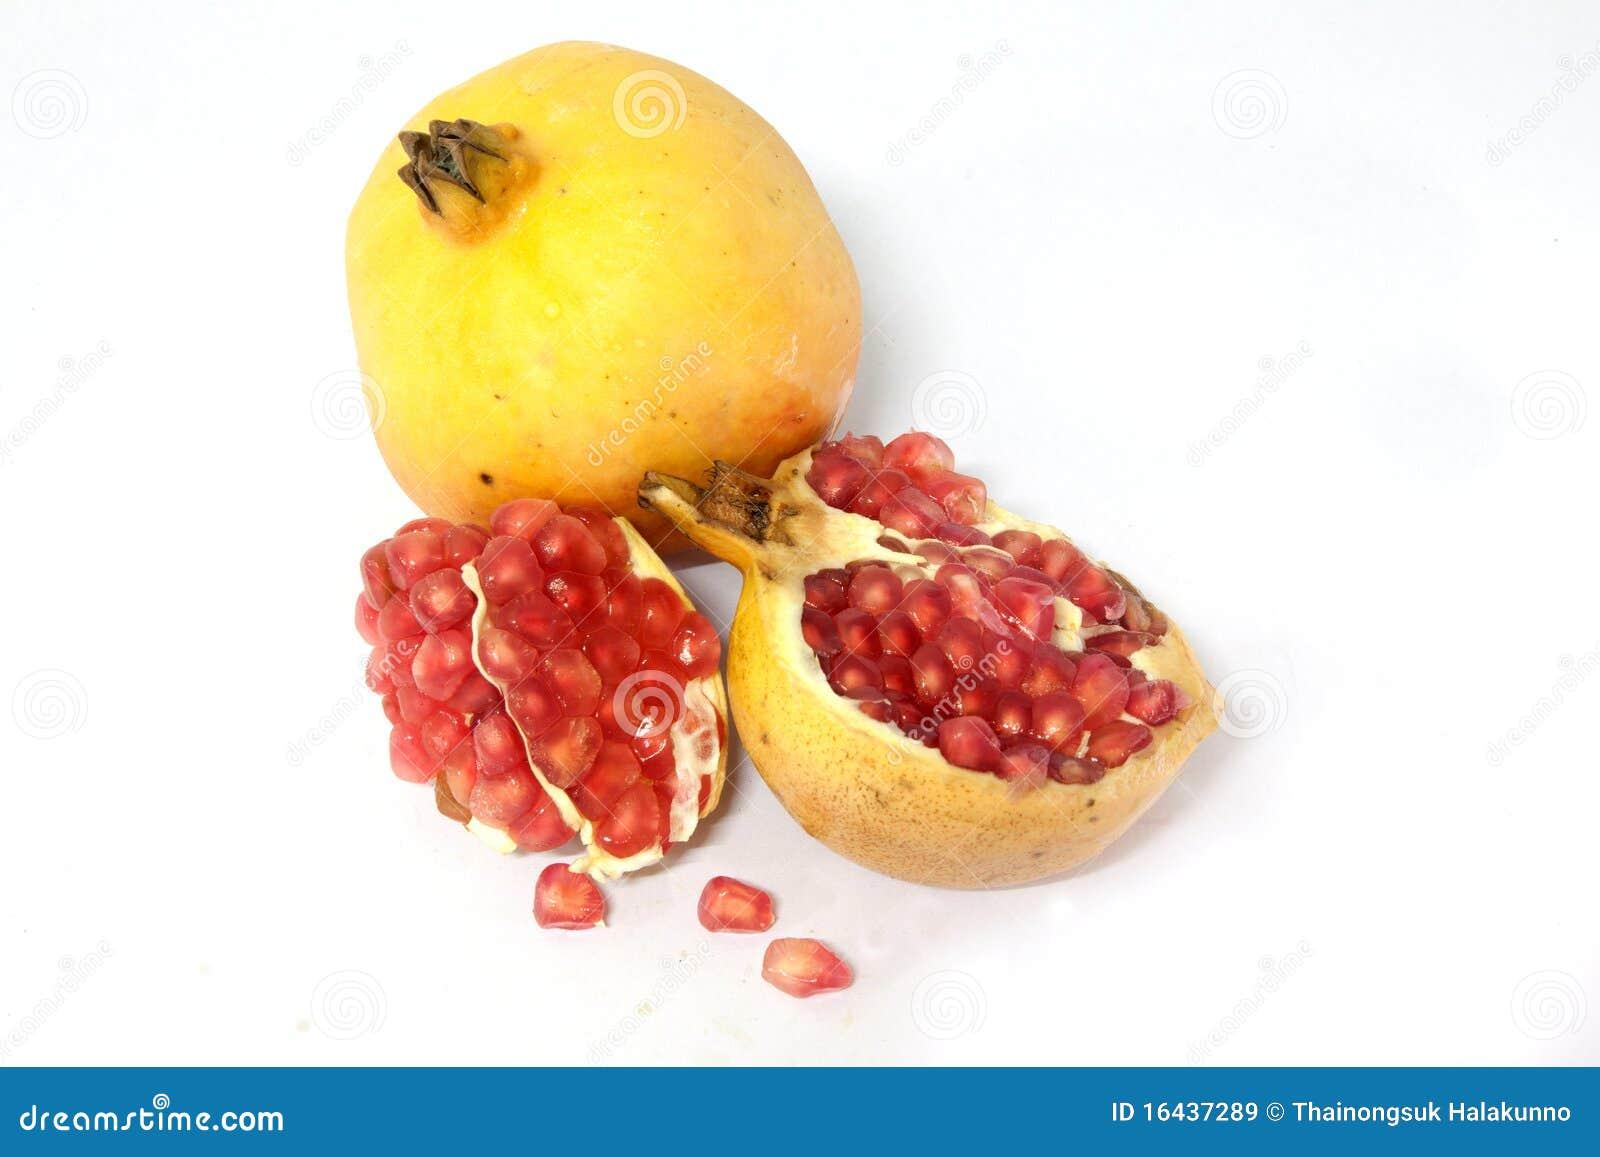 la grenade porte des fruits jaune images libres de droits image 16437289. Black Bedroom Furniture Sets. Home Design Ideas